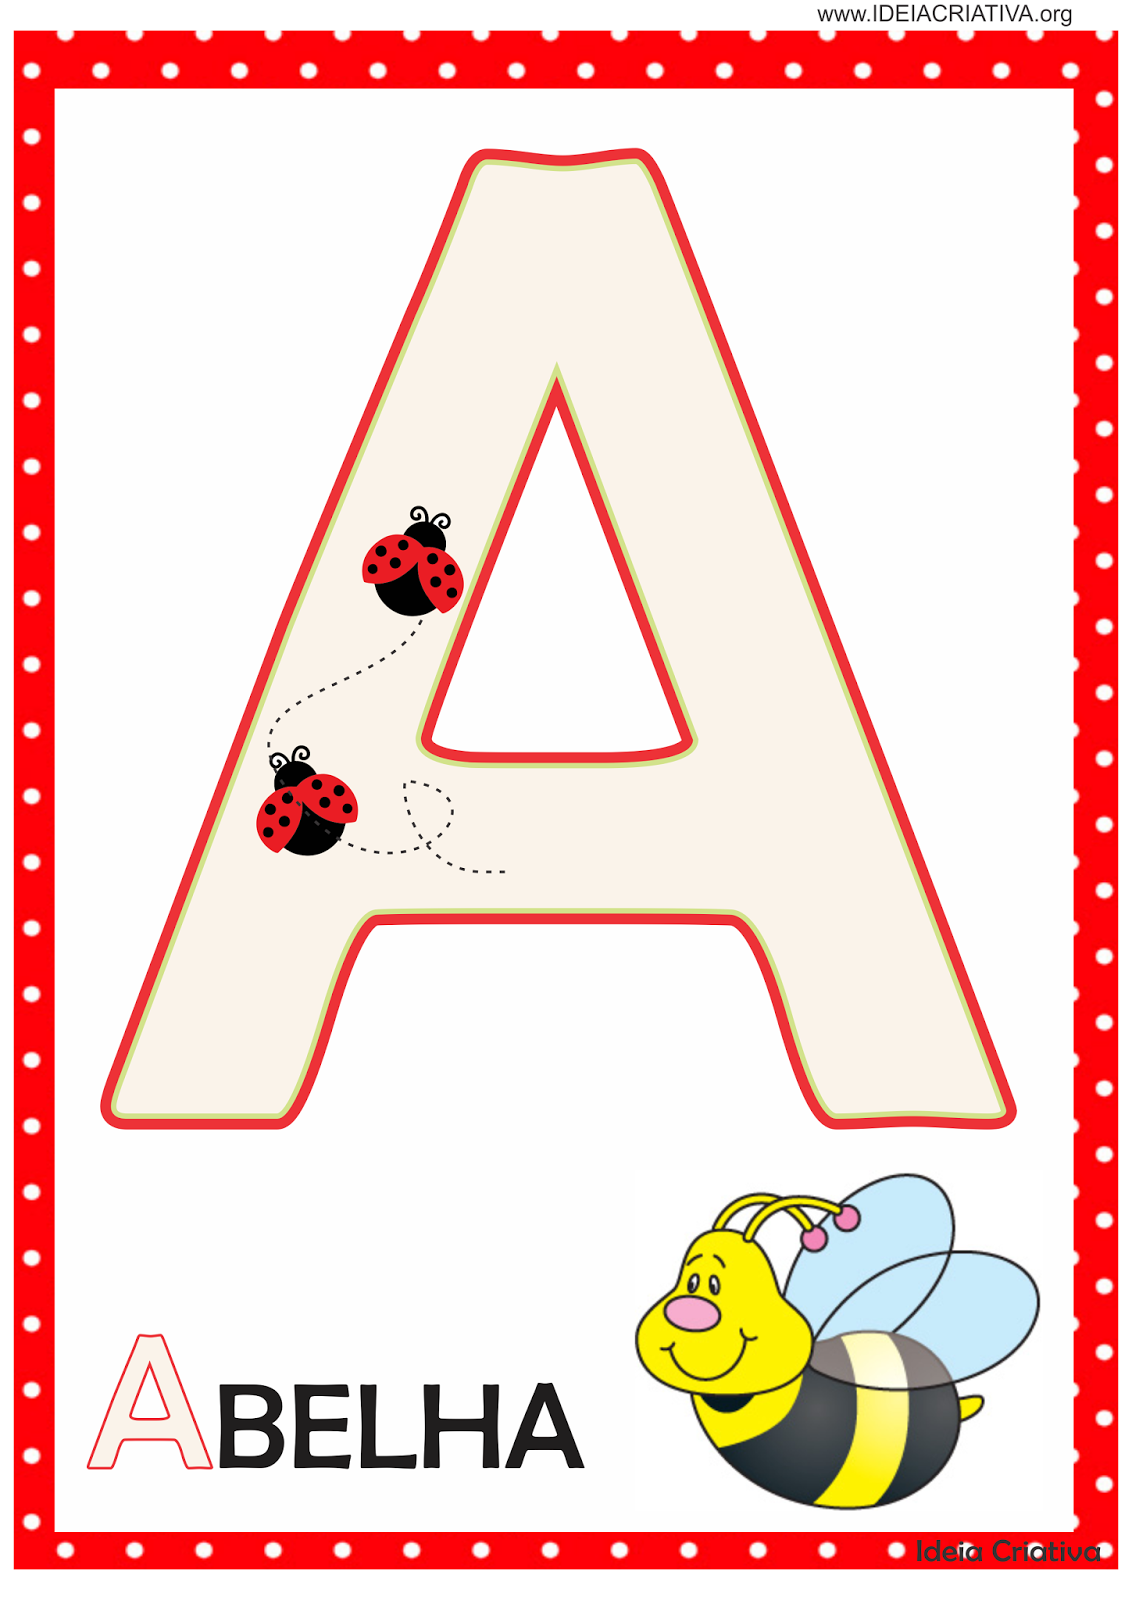 Alfabeto Joaninha Para Imprimir Gratis Modelos De Alfabeto